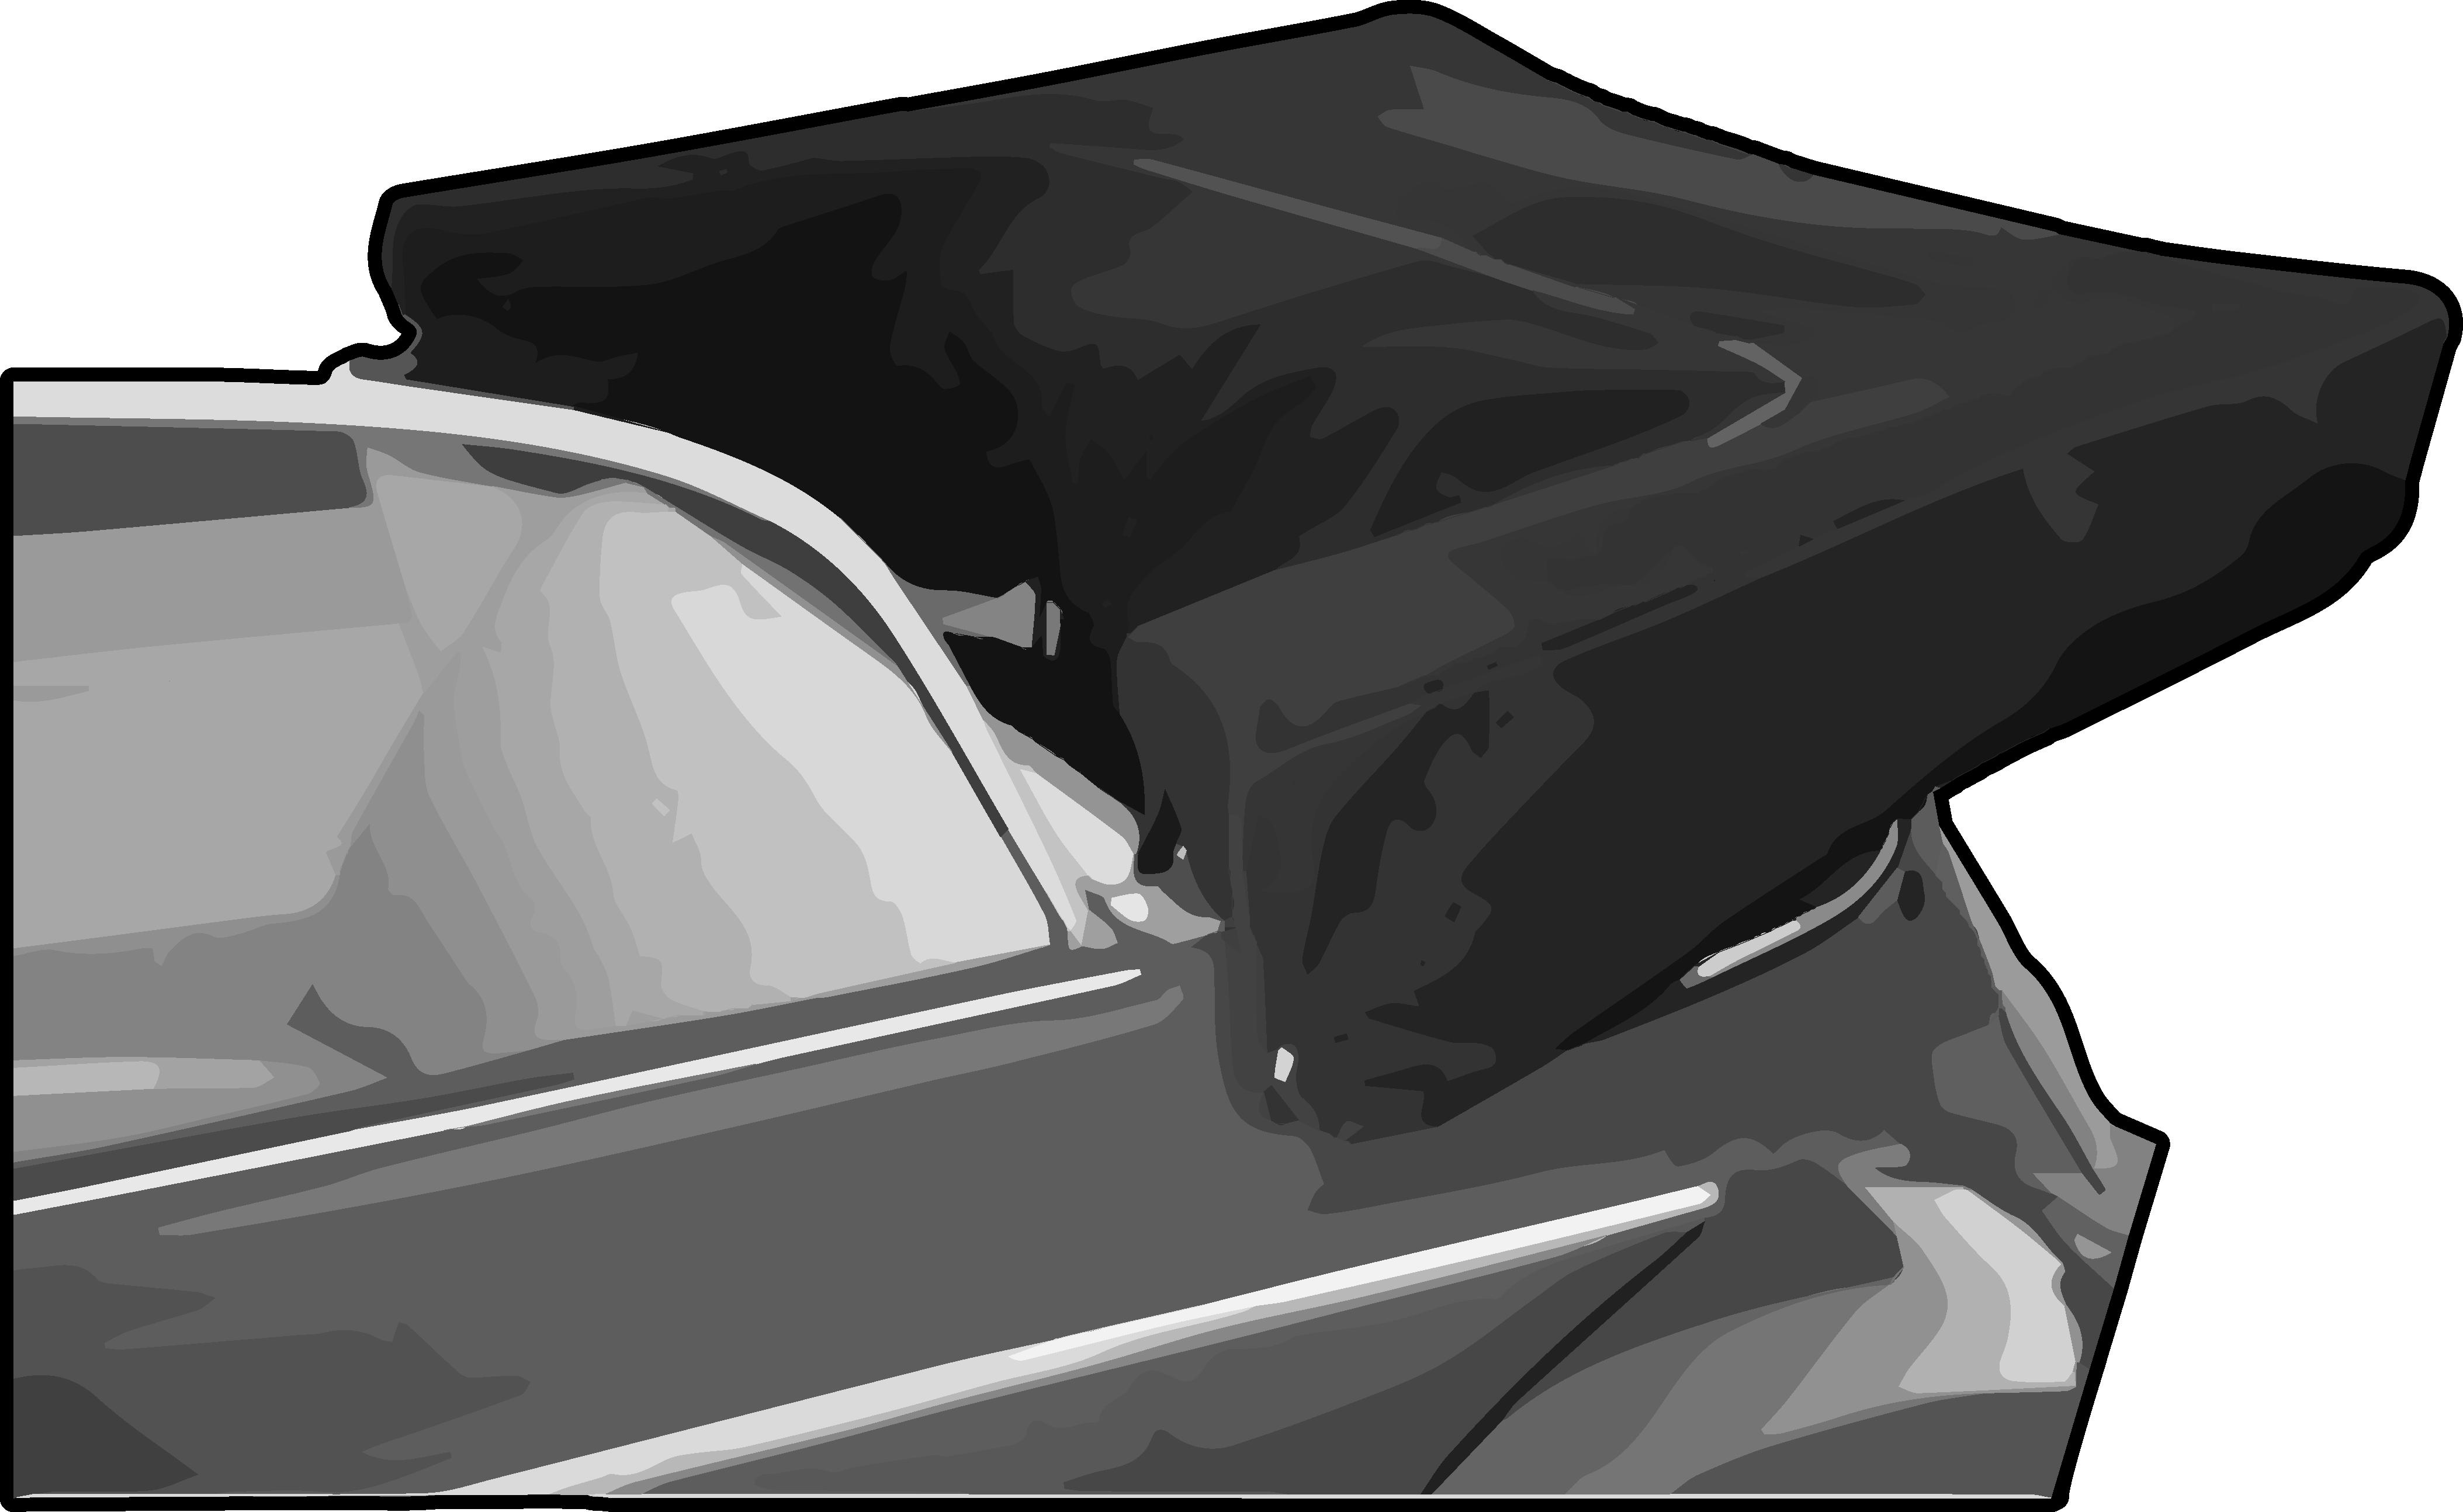 Sitzbezüge Sitzbezug Schonbezüge für Alfa Romeo 156 Schwarz Modern MG-1 Set